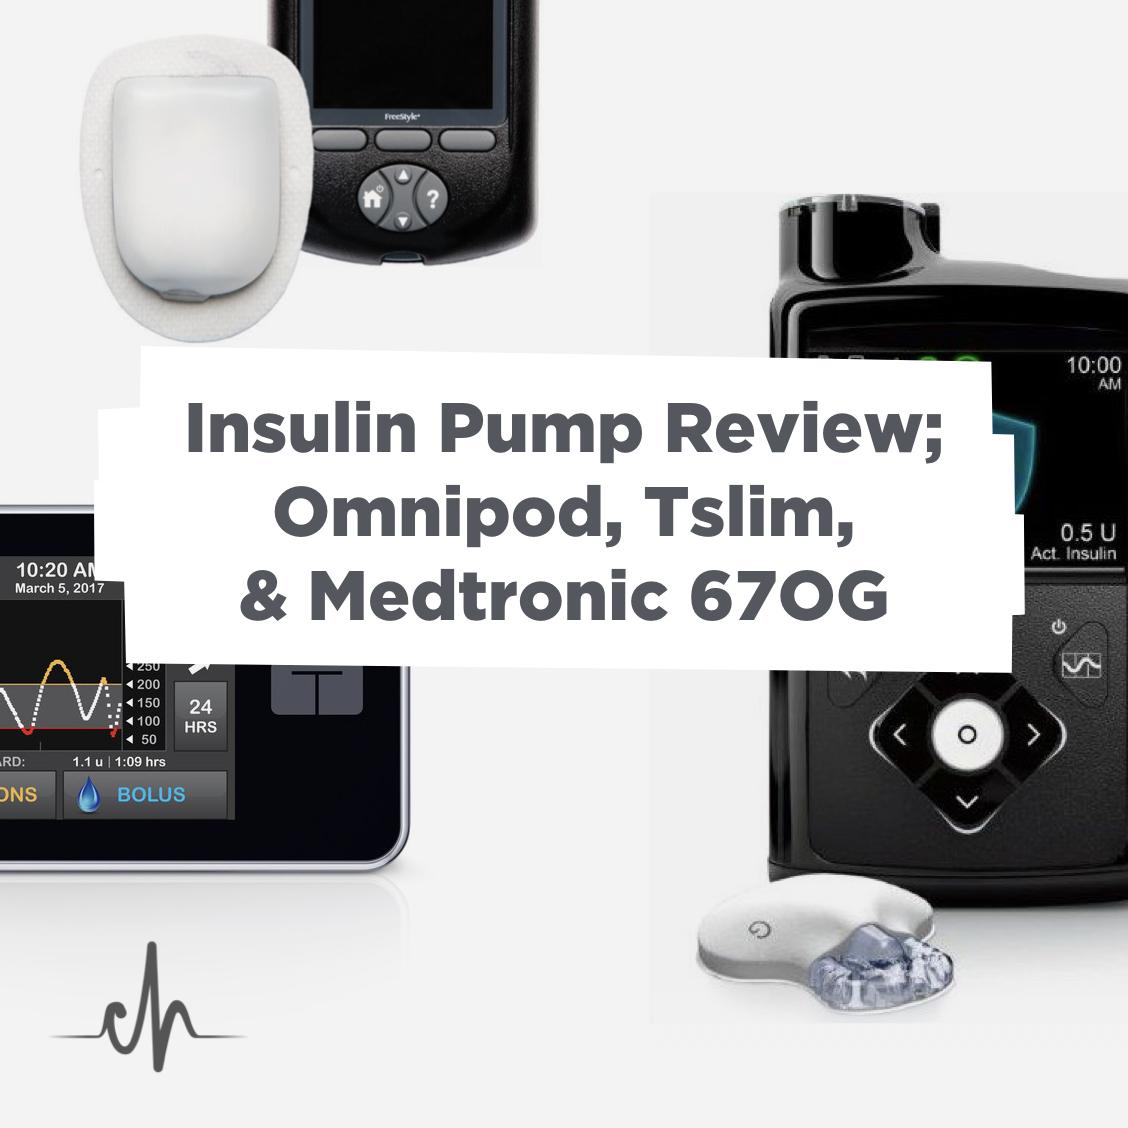 Insulin Pump Review